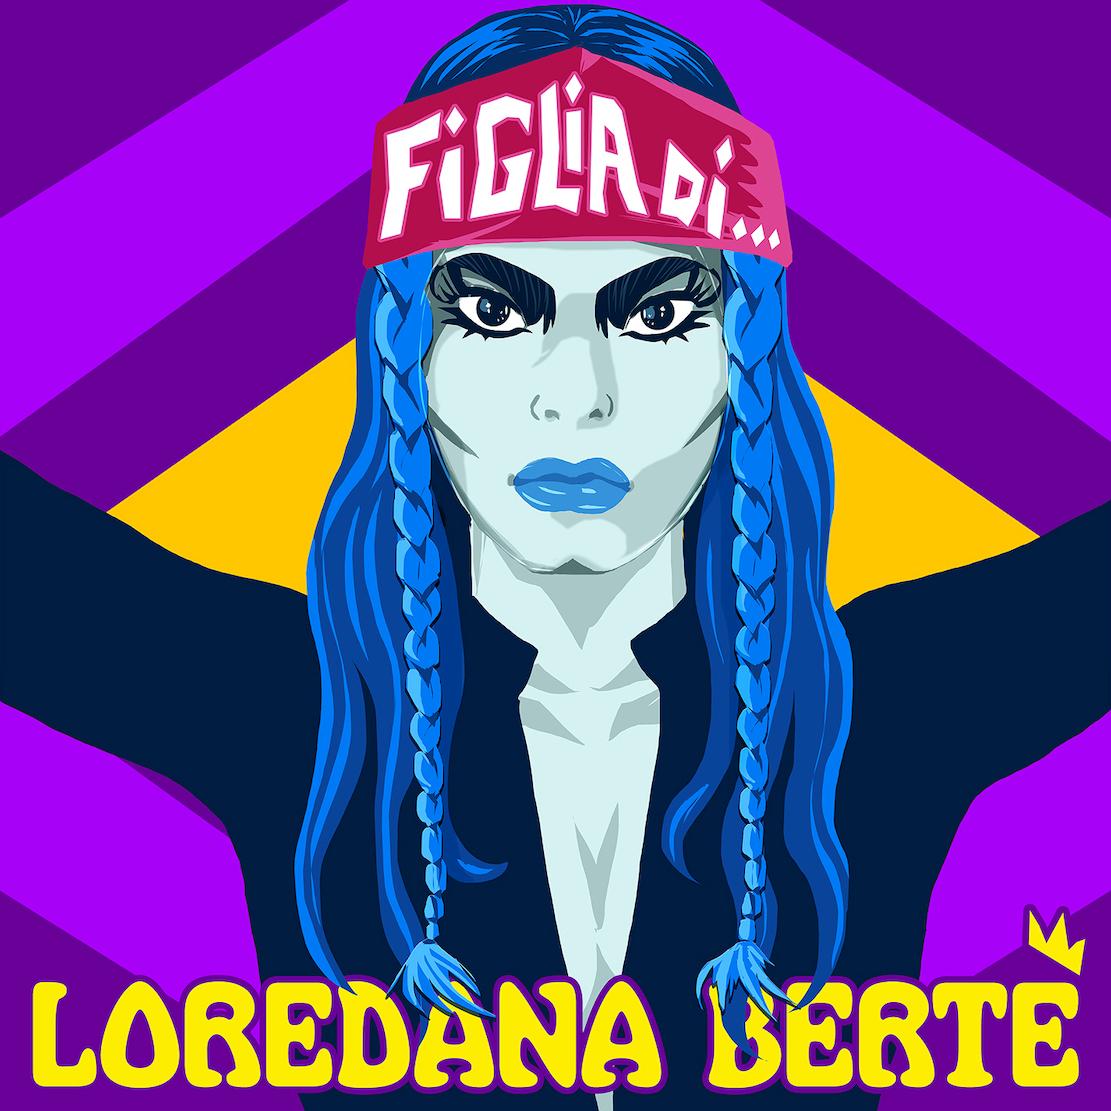 Loredana Berté album e tour - immagini